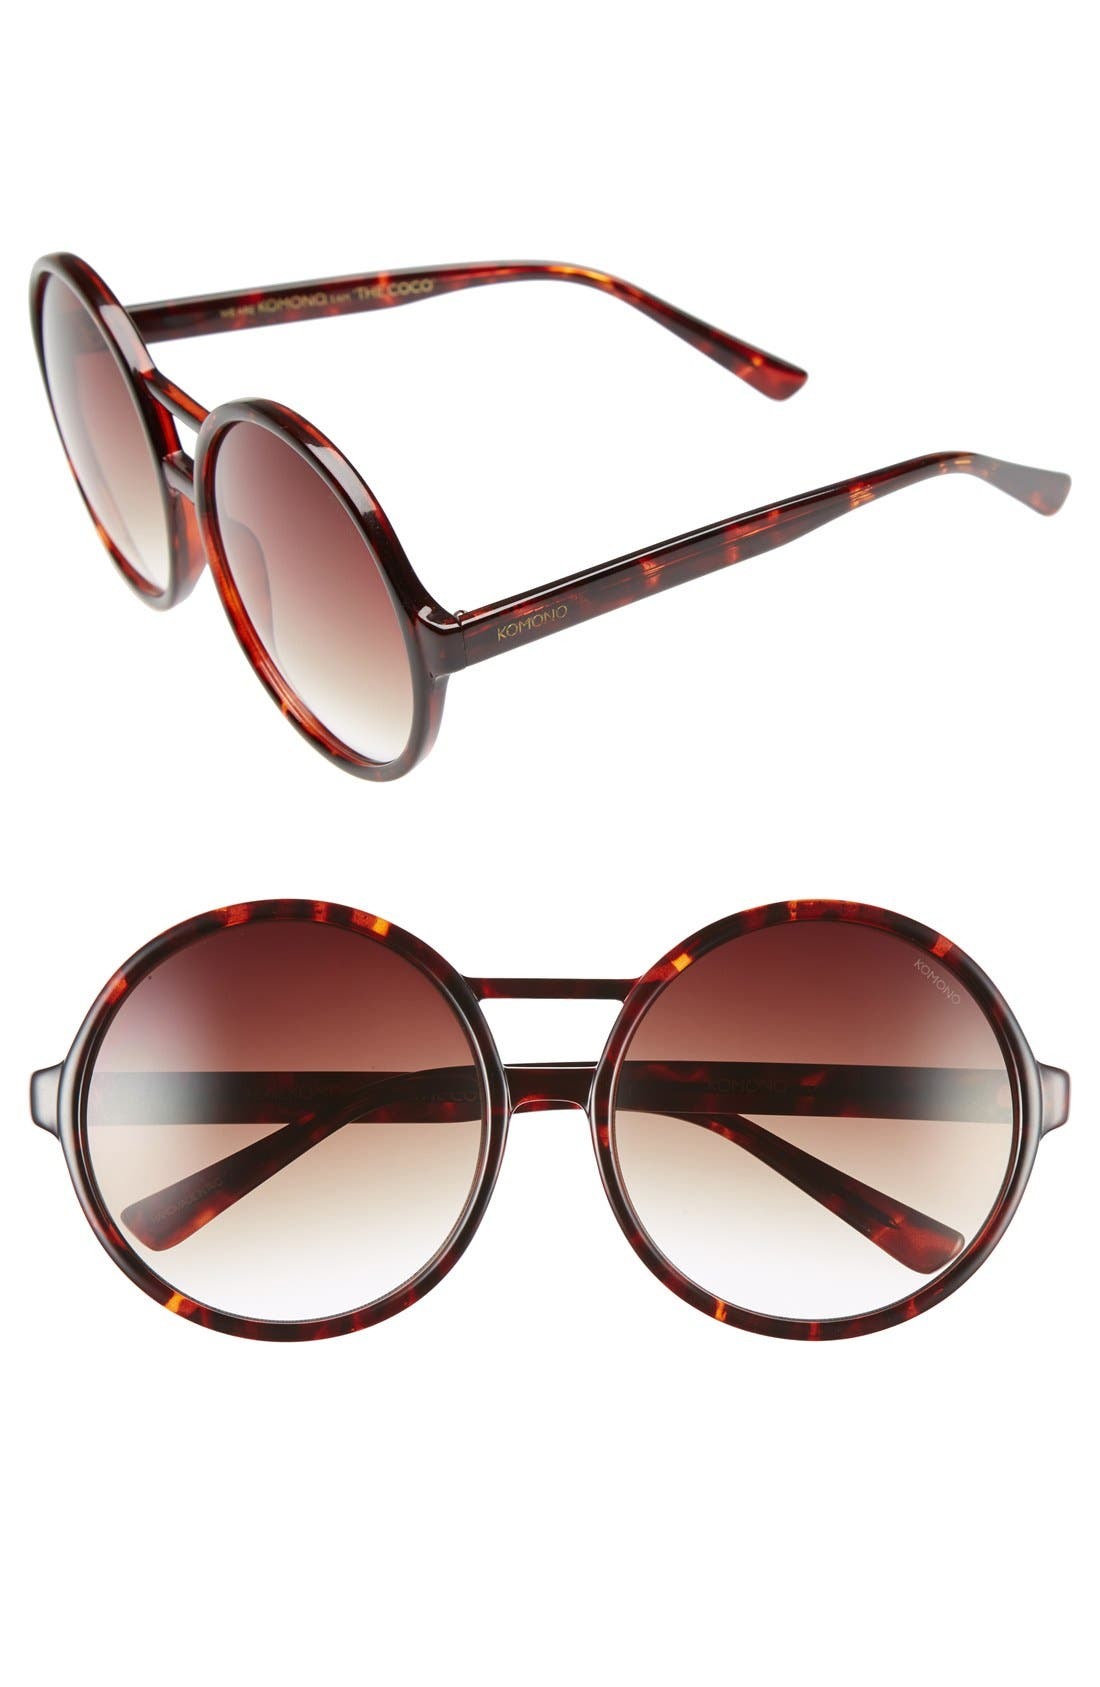 Main Image - Komono 'Coco' 58mm Sunglasses